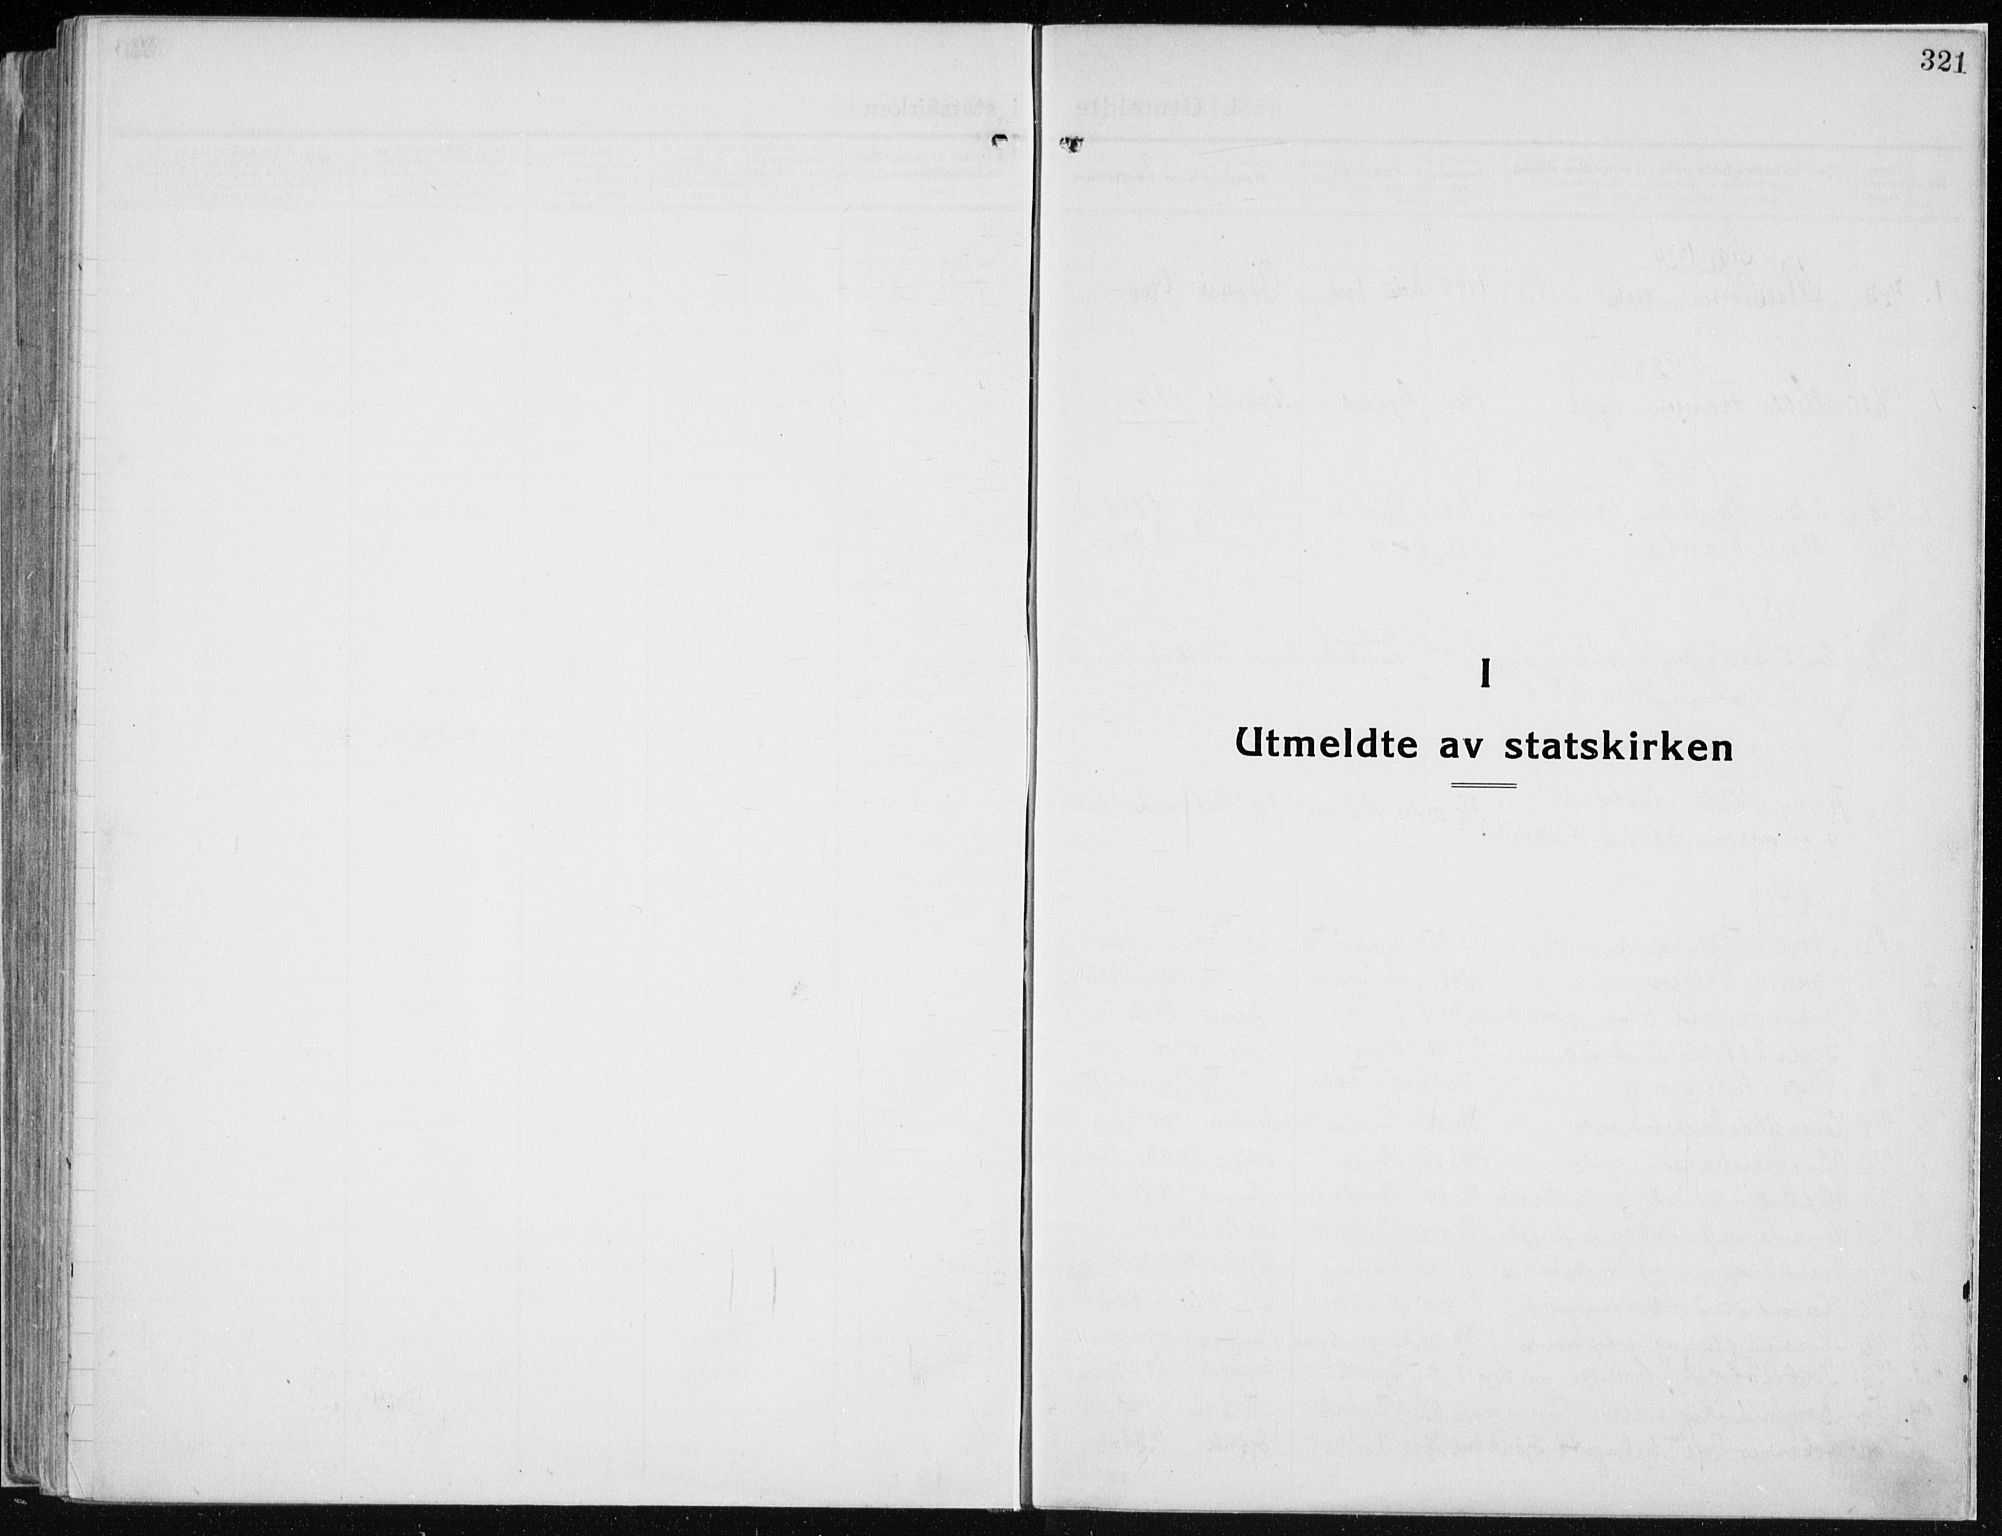 SAH, Vardal prestekontor, H/Ha/Haa/L0015: Ministerialbok nr. 15, 1923-1937, s. 321